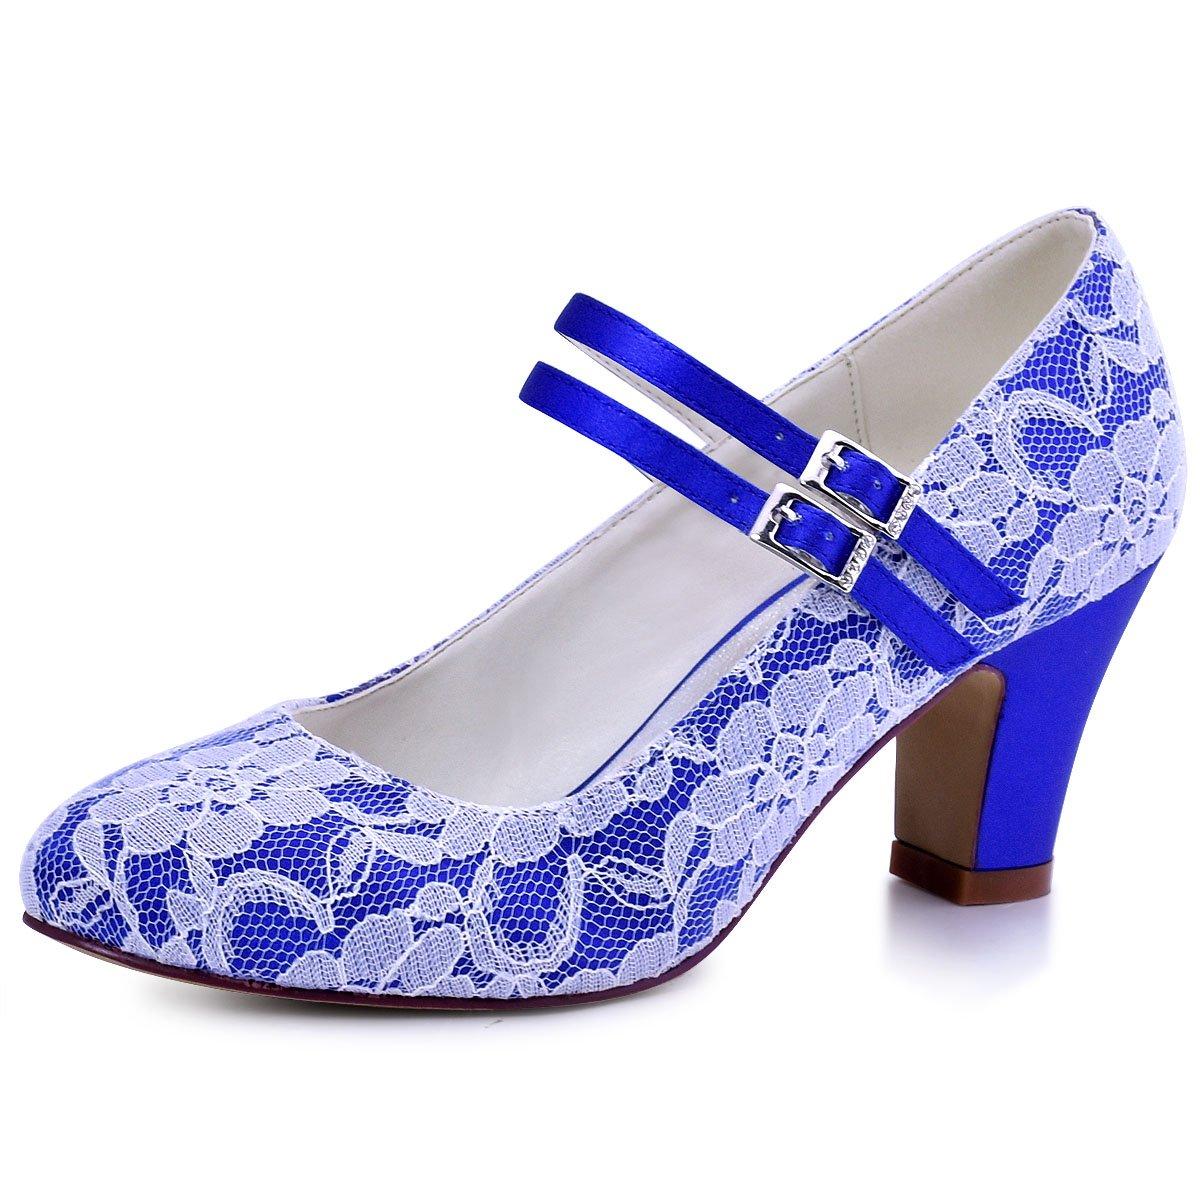 Elegantpark HC1708 Mujer Bloquear Heel Mary Jane Pumps Hebilla Satén Cordones Zapatos de Novia 39 EU